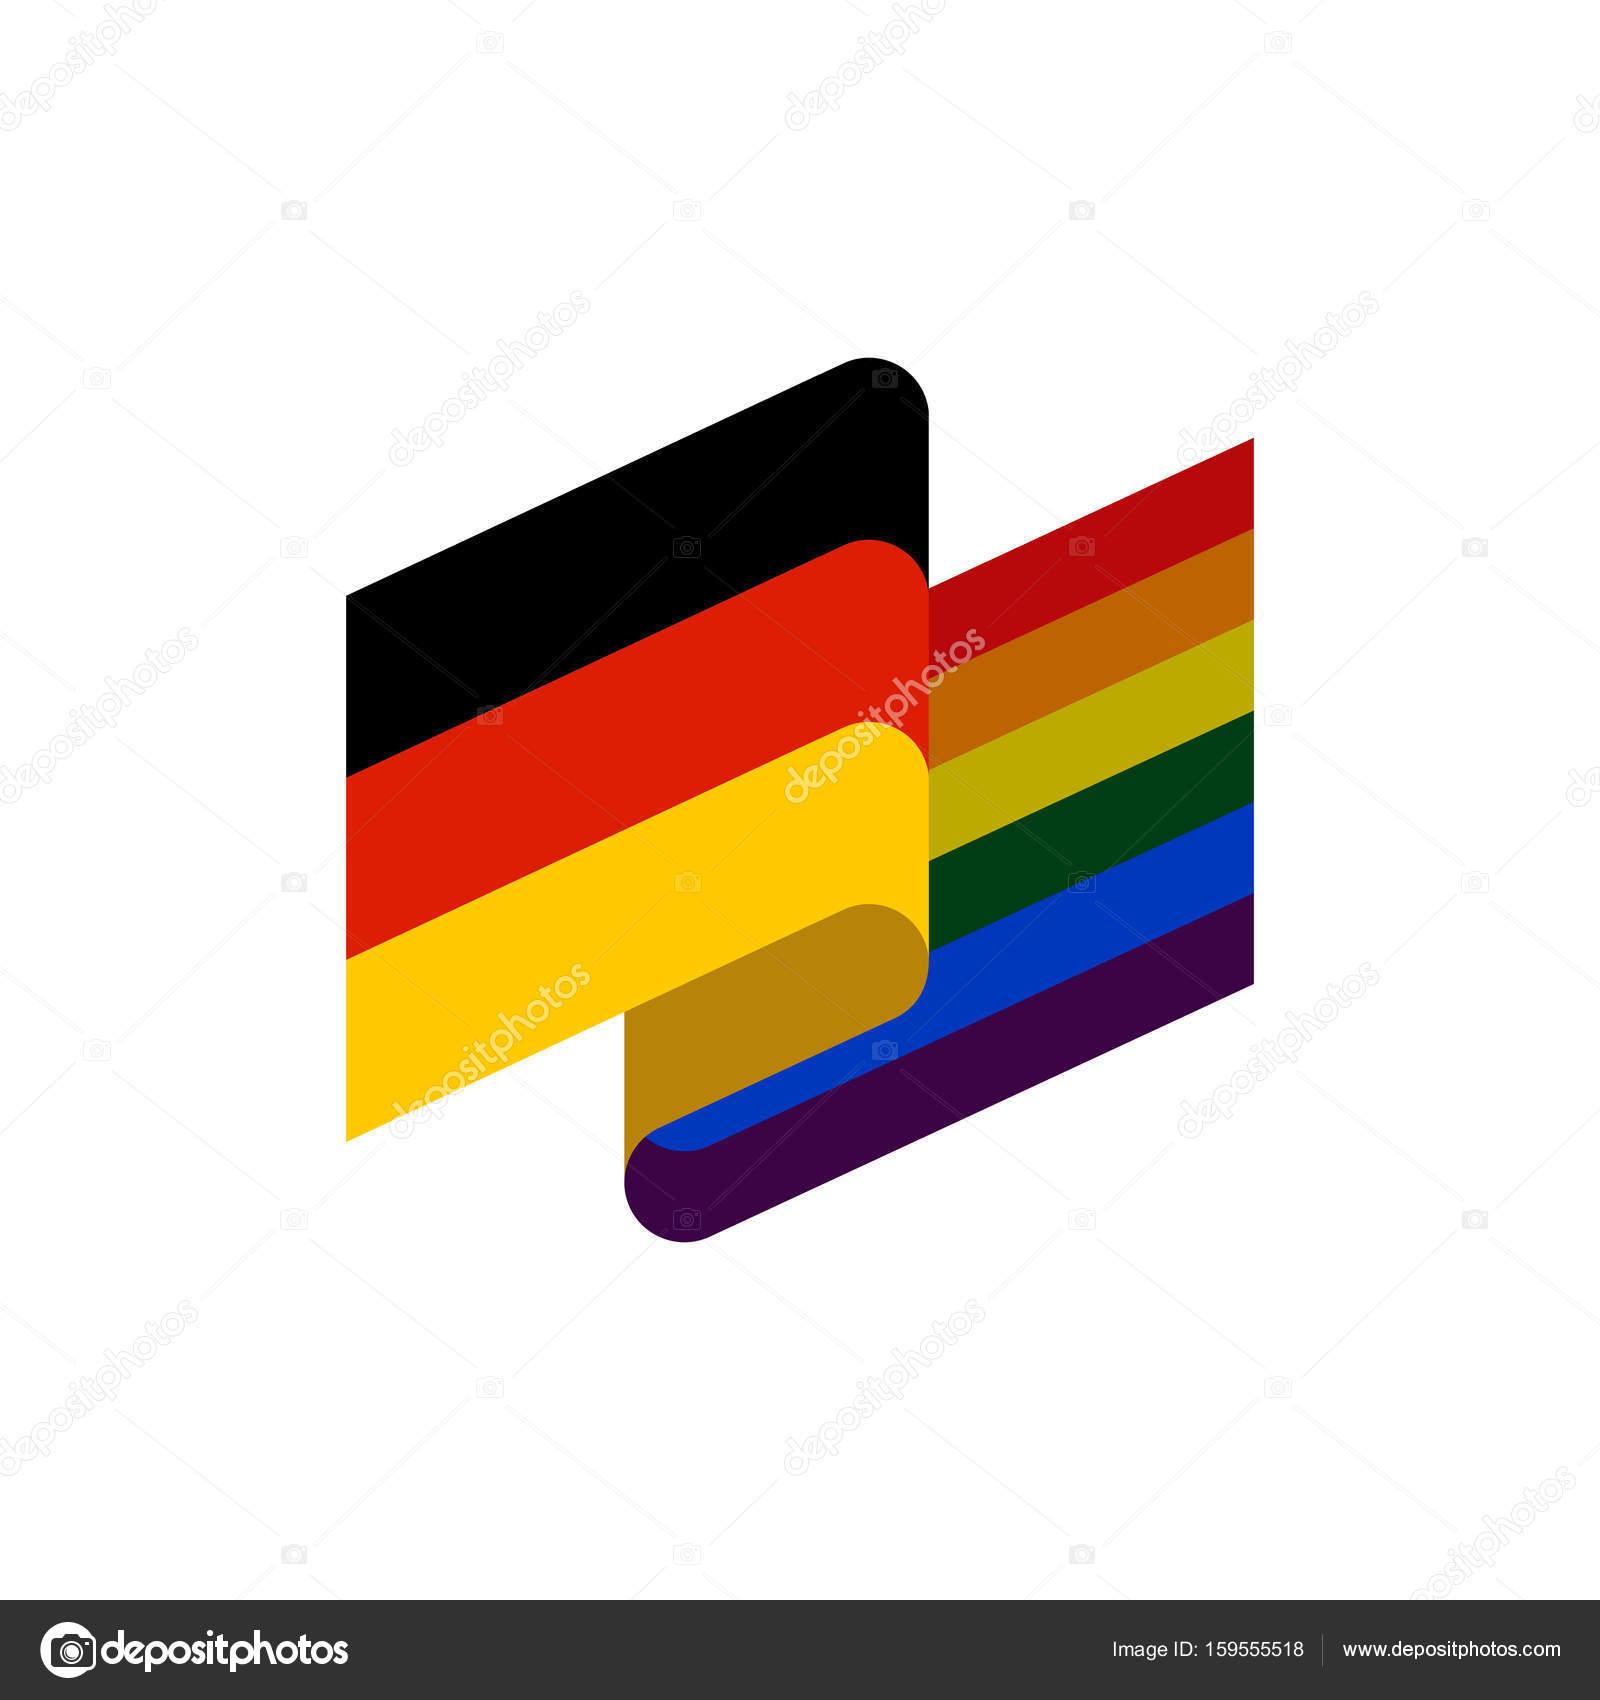 Символы и знаки гомосексуалистов